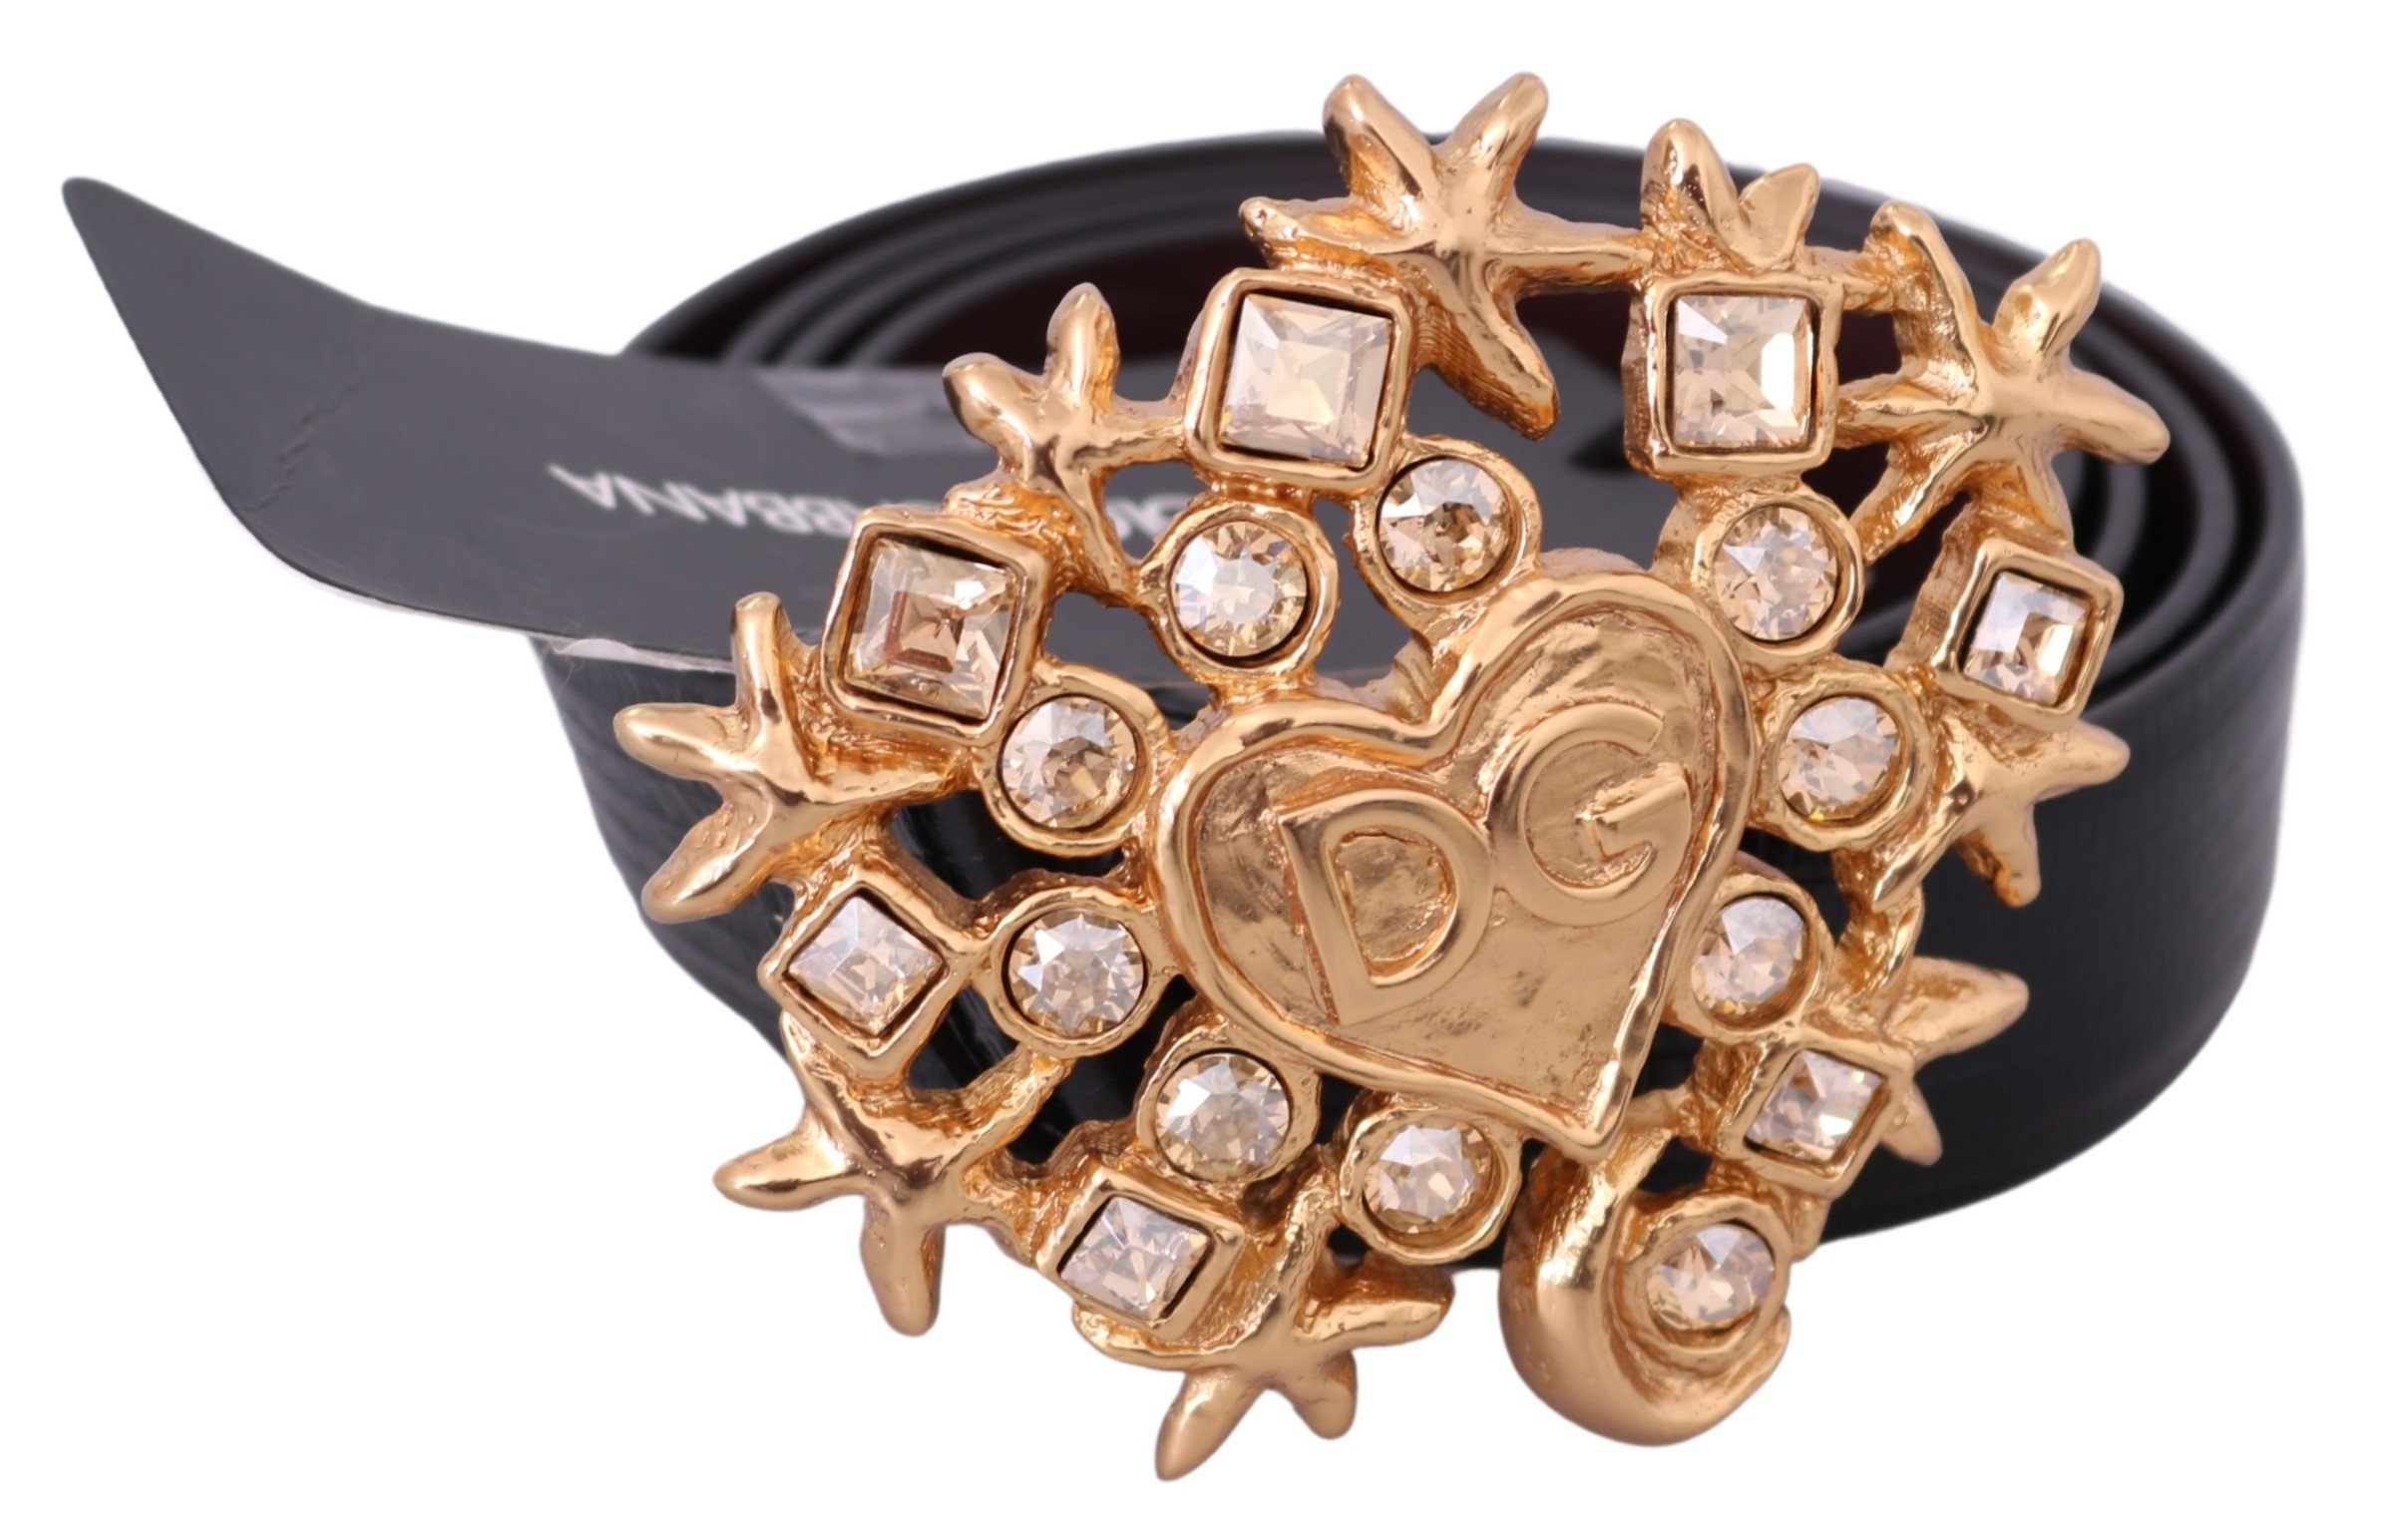 Dolce & Gabbana Men's Leather Heart Crystal Buckle Belt Black BEL60493 - 100 cm / 40 Inches